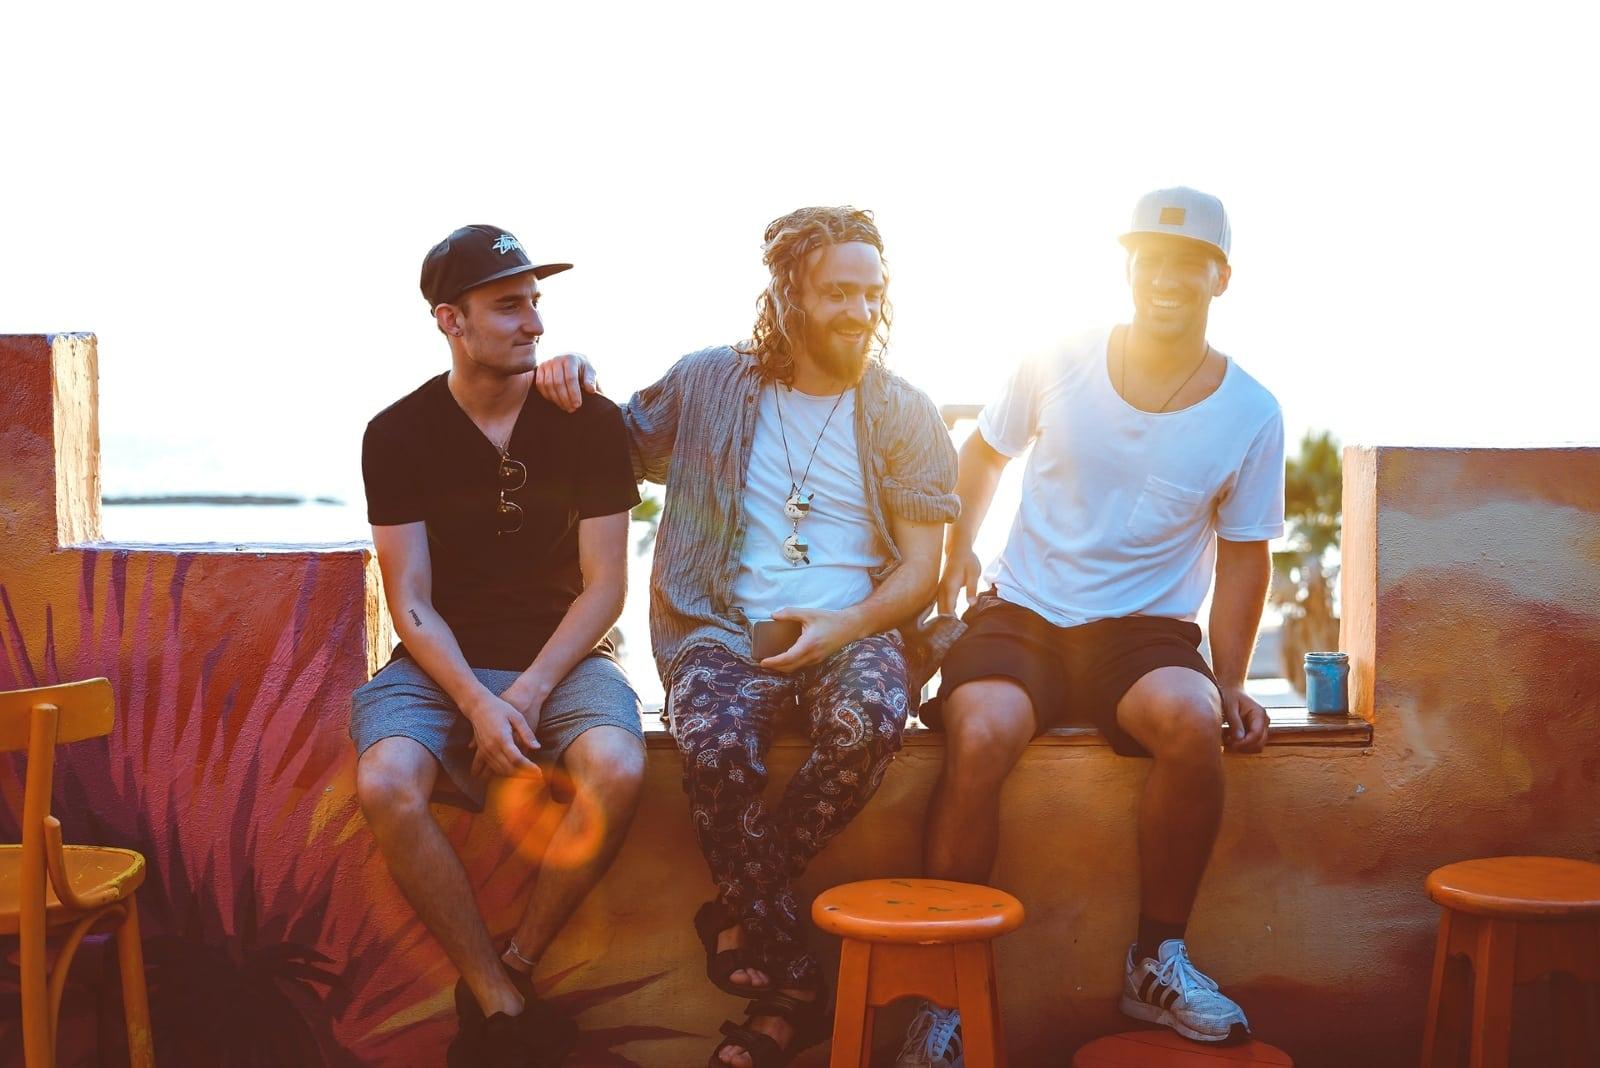 three men talking while sitting outdoor